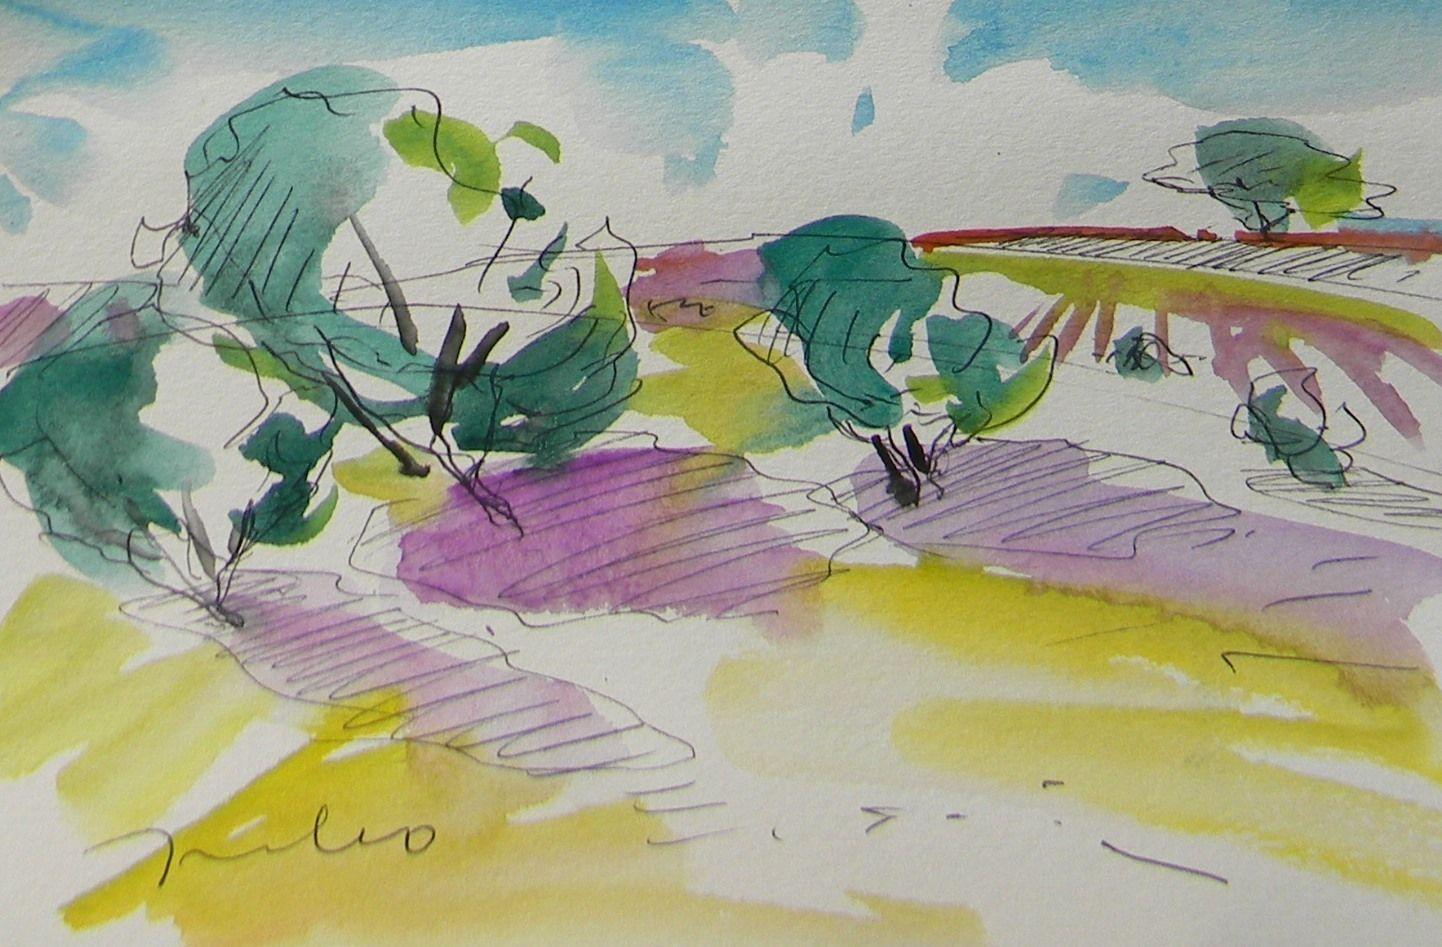 1442x947 Jose Trujillo Original Watercolor Painting Impressionist Landscape